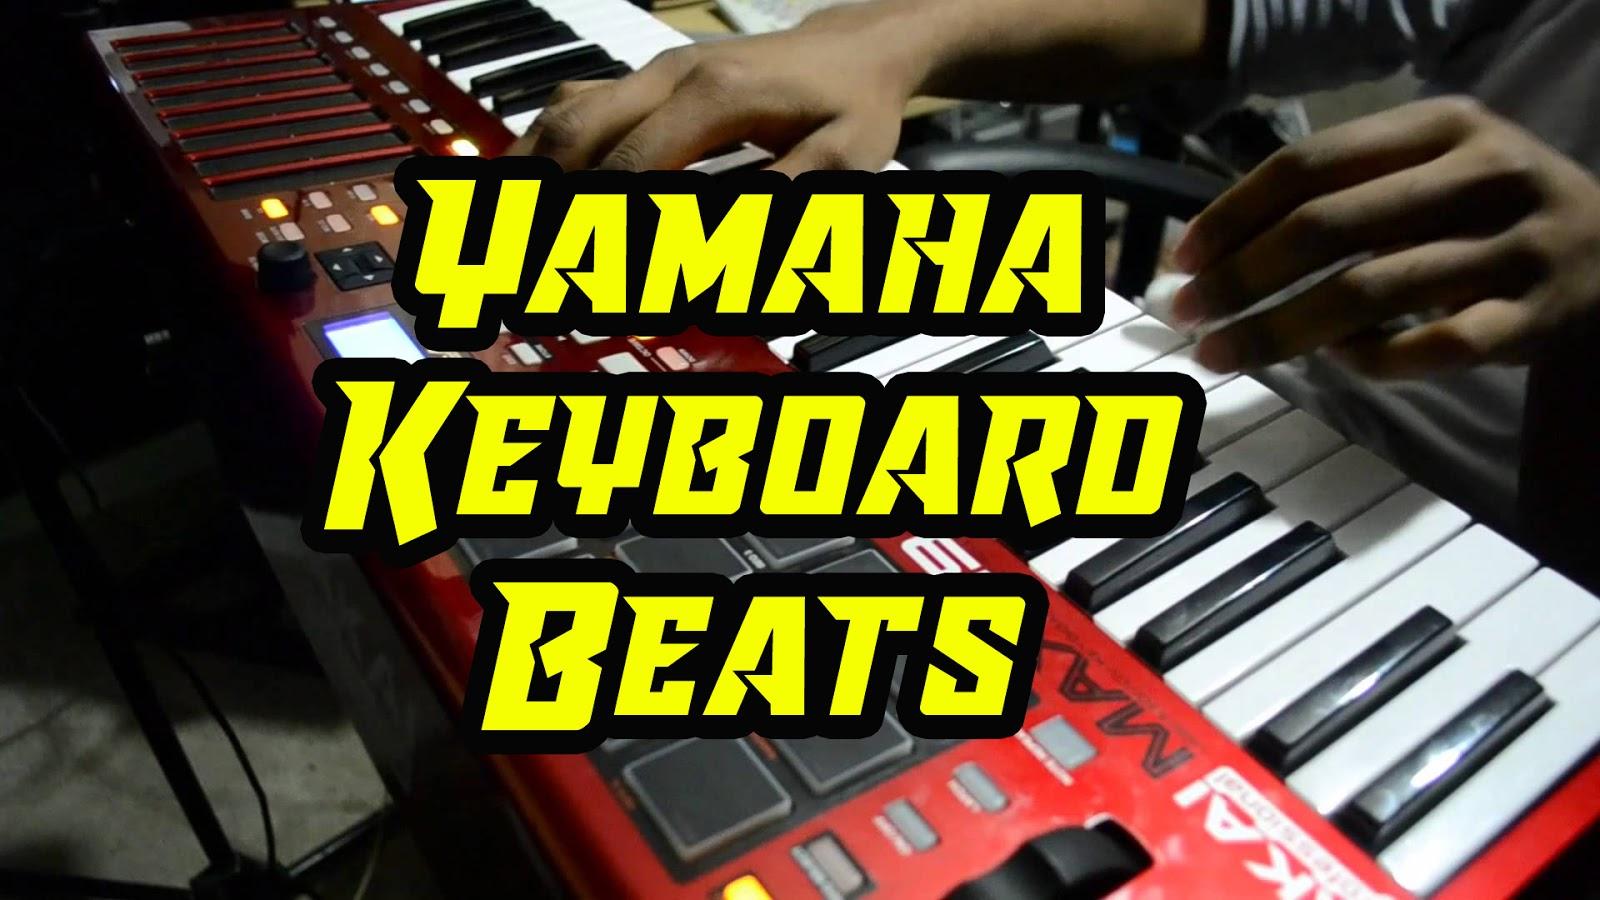 YAMAHA Keyboard Beats - SoundsLanka - Free Download Kontakt